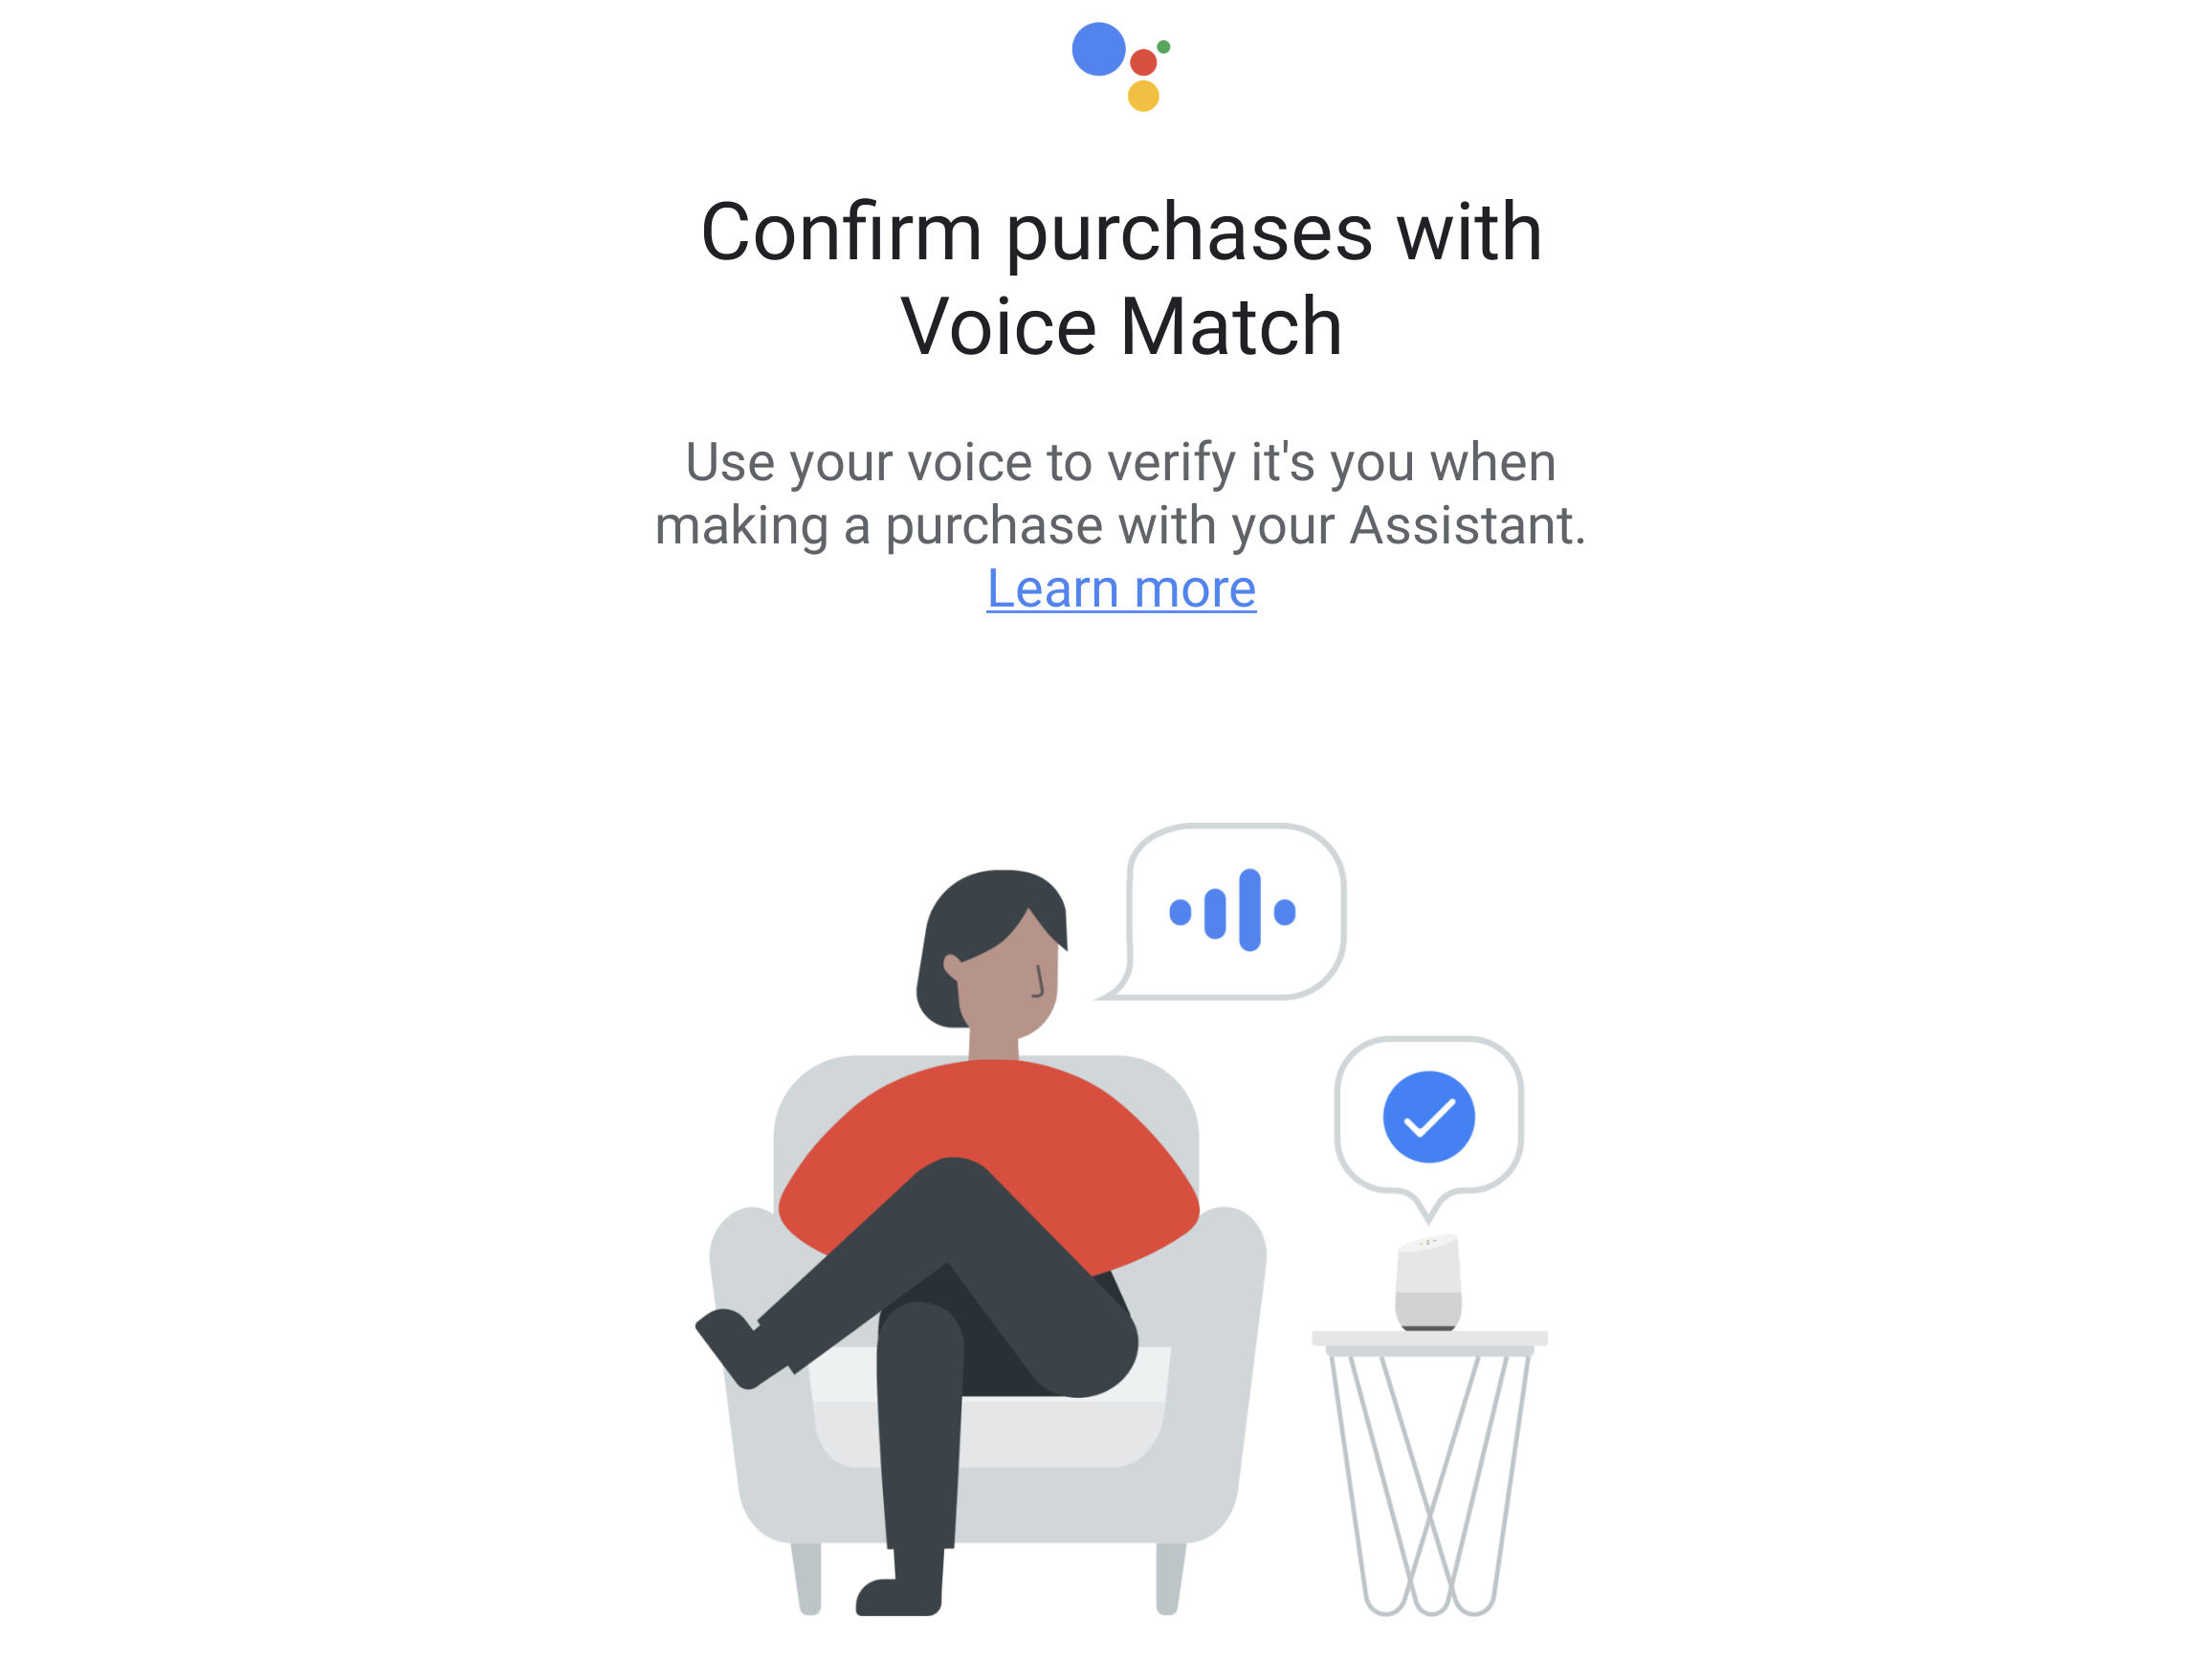 voicematch